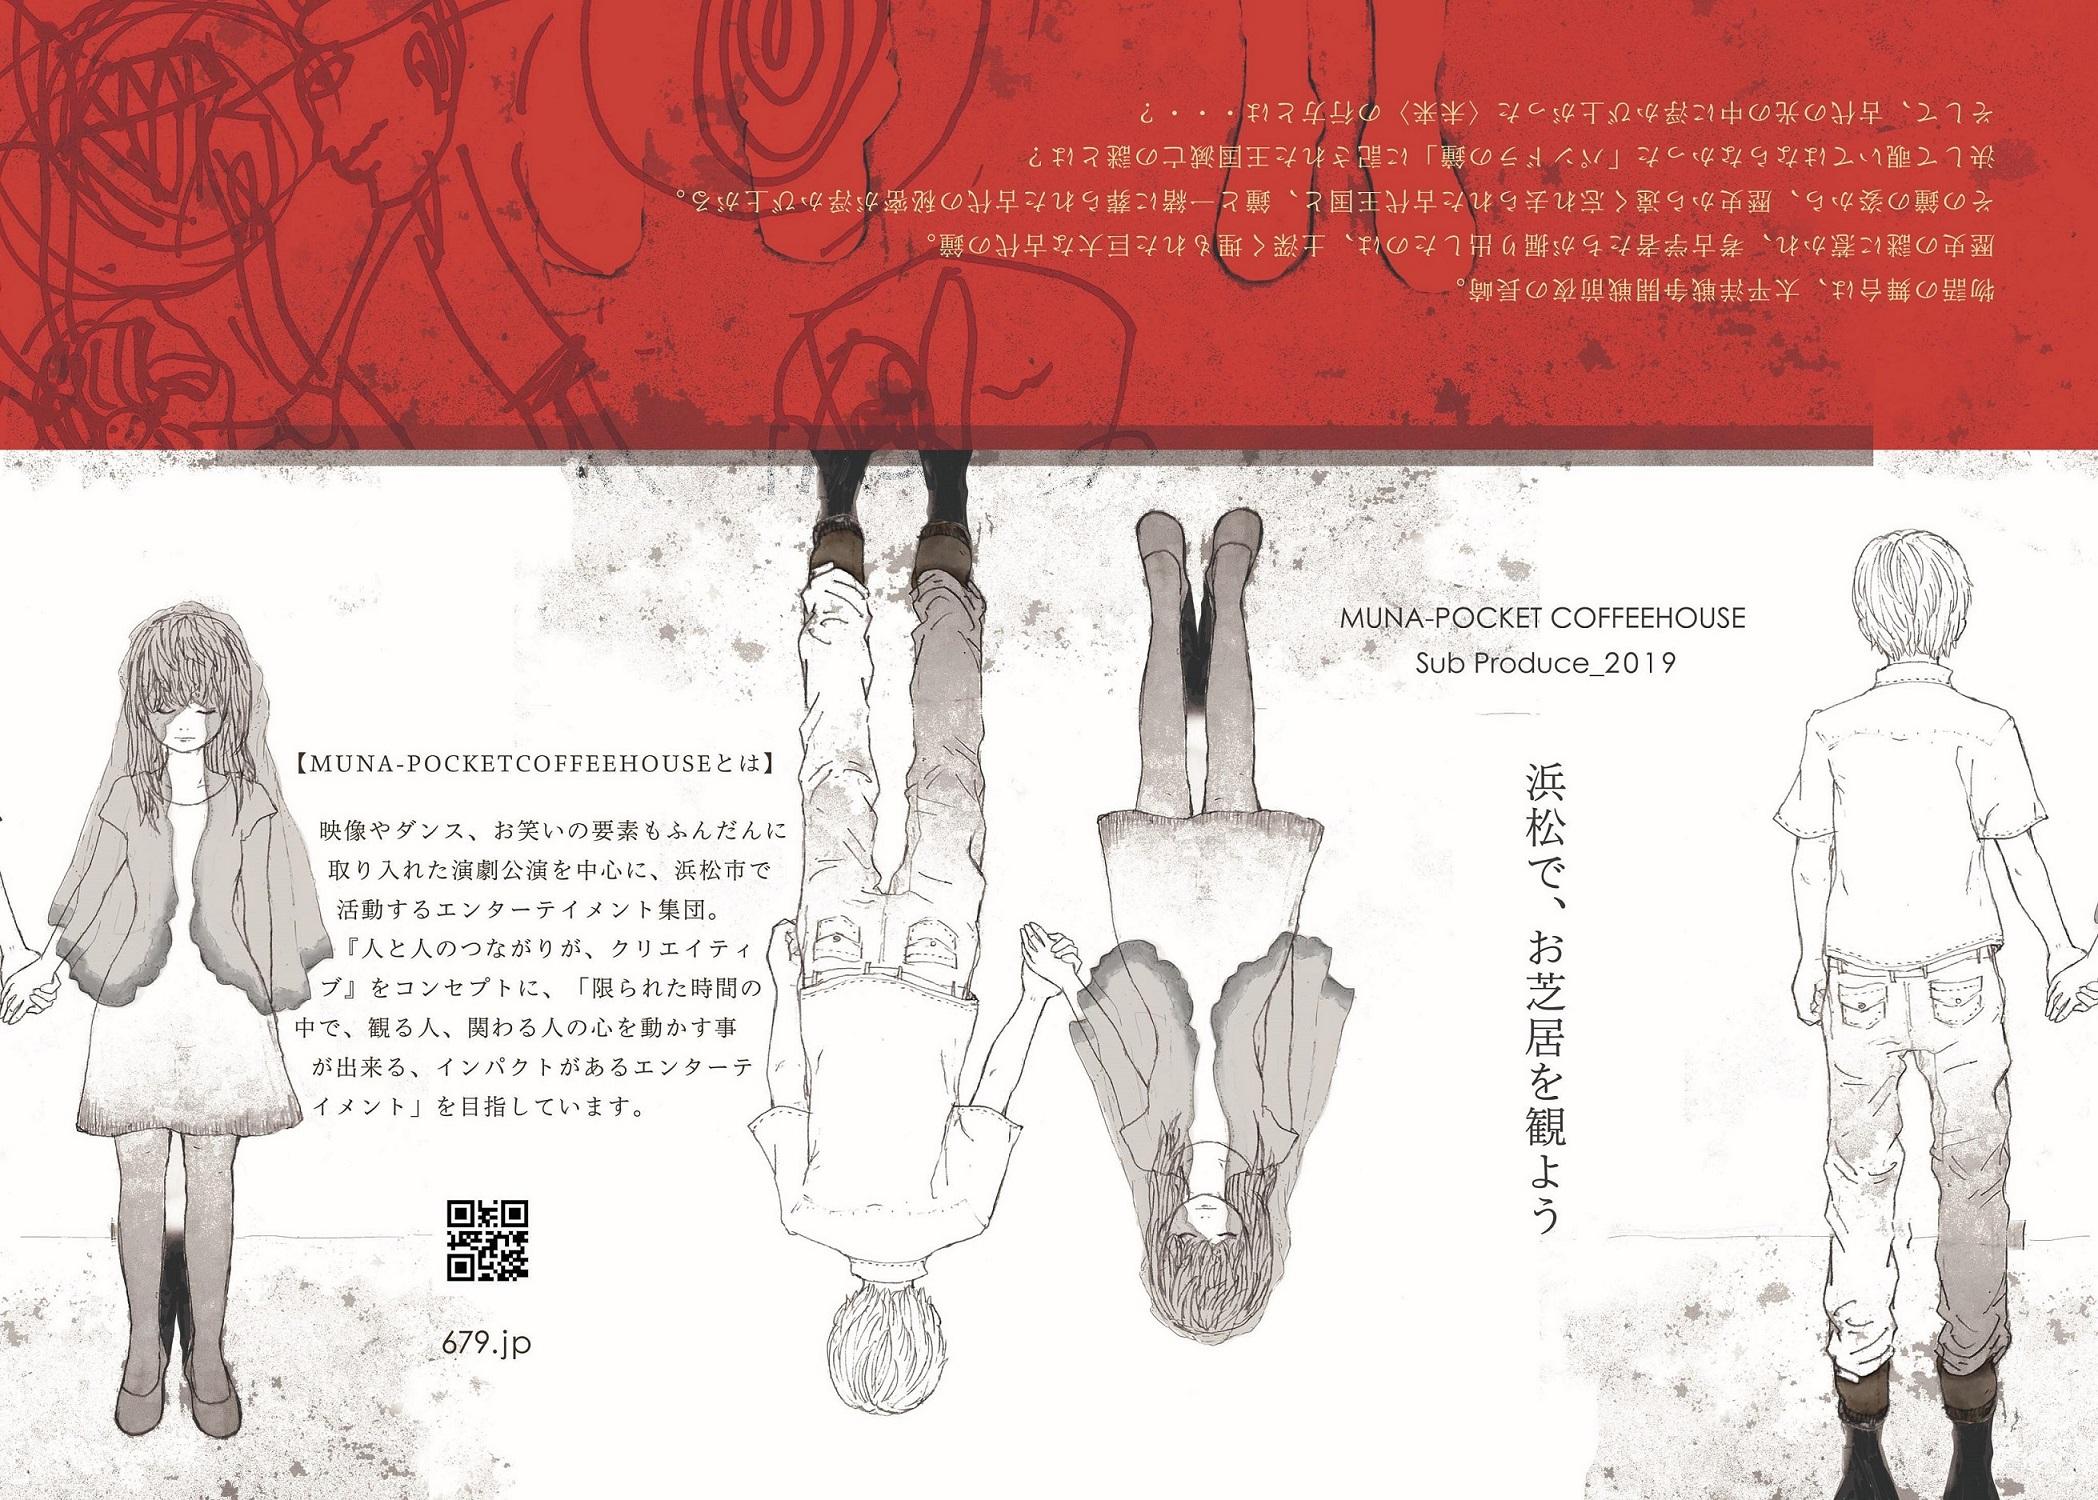 ☆WEB限定割引1回券☆6月2日(日)16:00~ MUNA-POCKET COFFEEHOUSE(ムナポケ)演劇公演「パンドラの鐘」